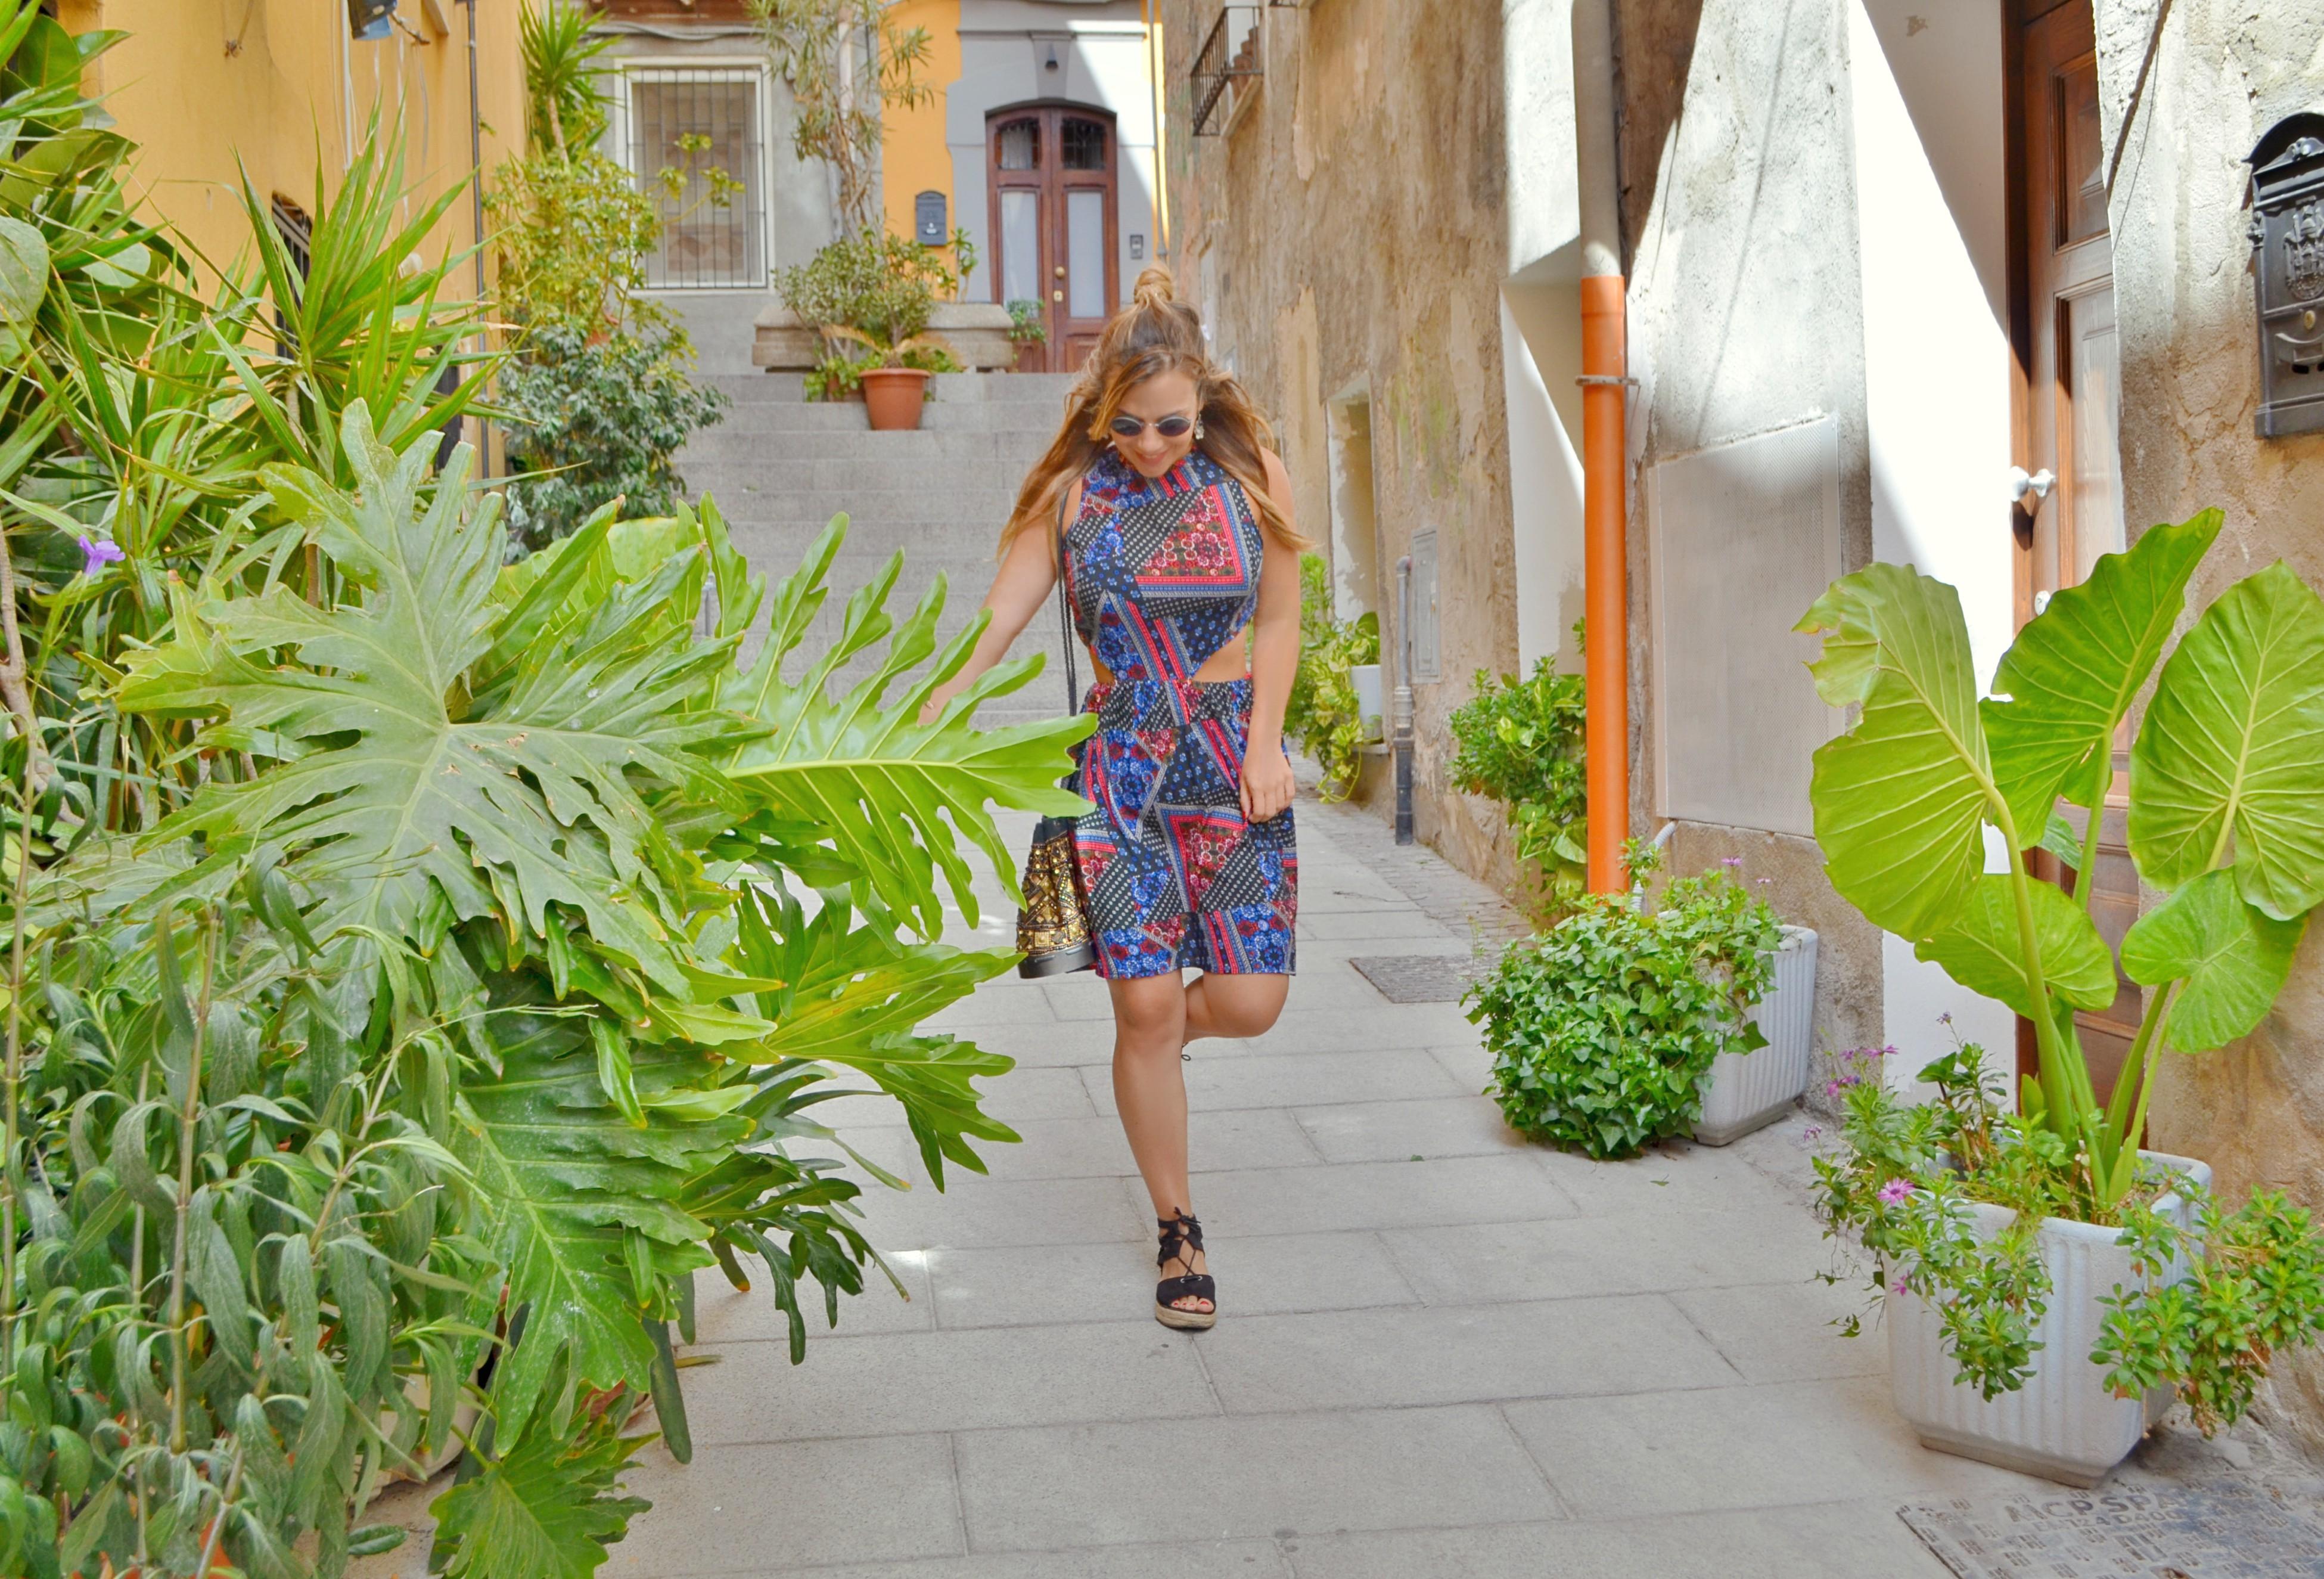 Influencer-Blog-de-moda-ChicAdicta-fashionista-Chic-Adicta-Asos-dresses-hippie-style-verono-outfit-gafas-silhouette-PiensaenChic-Piensa-en-Chic